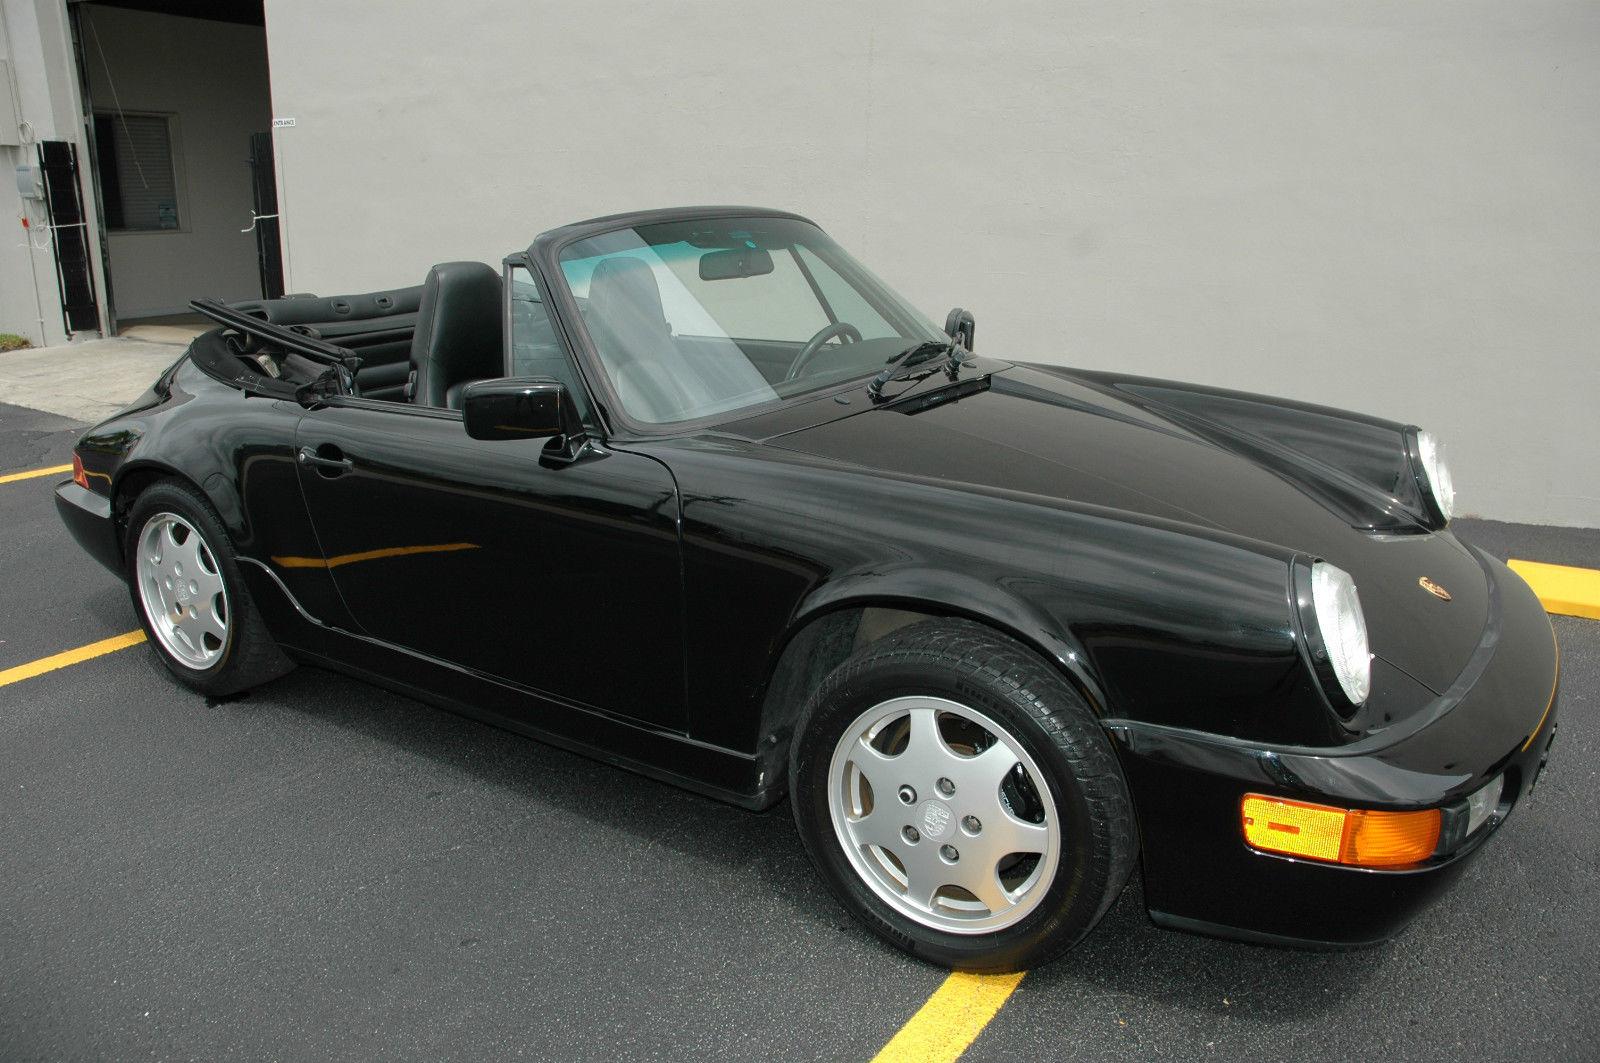 1991 porsche 911 carrera 4 convertible 2 door 3 6l for sale photos technical specifications. Black Bedroom Furniture Sets. Home Design Ideas